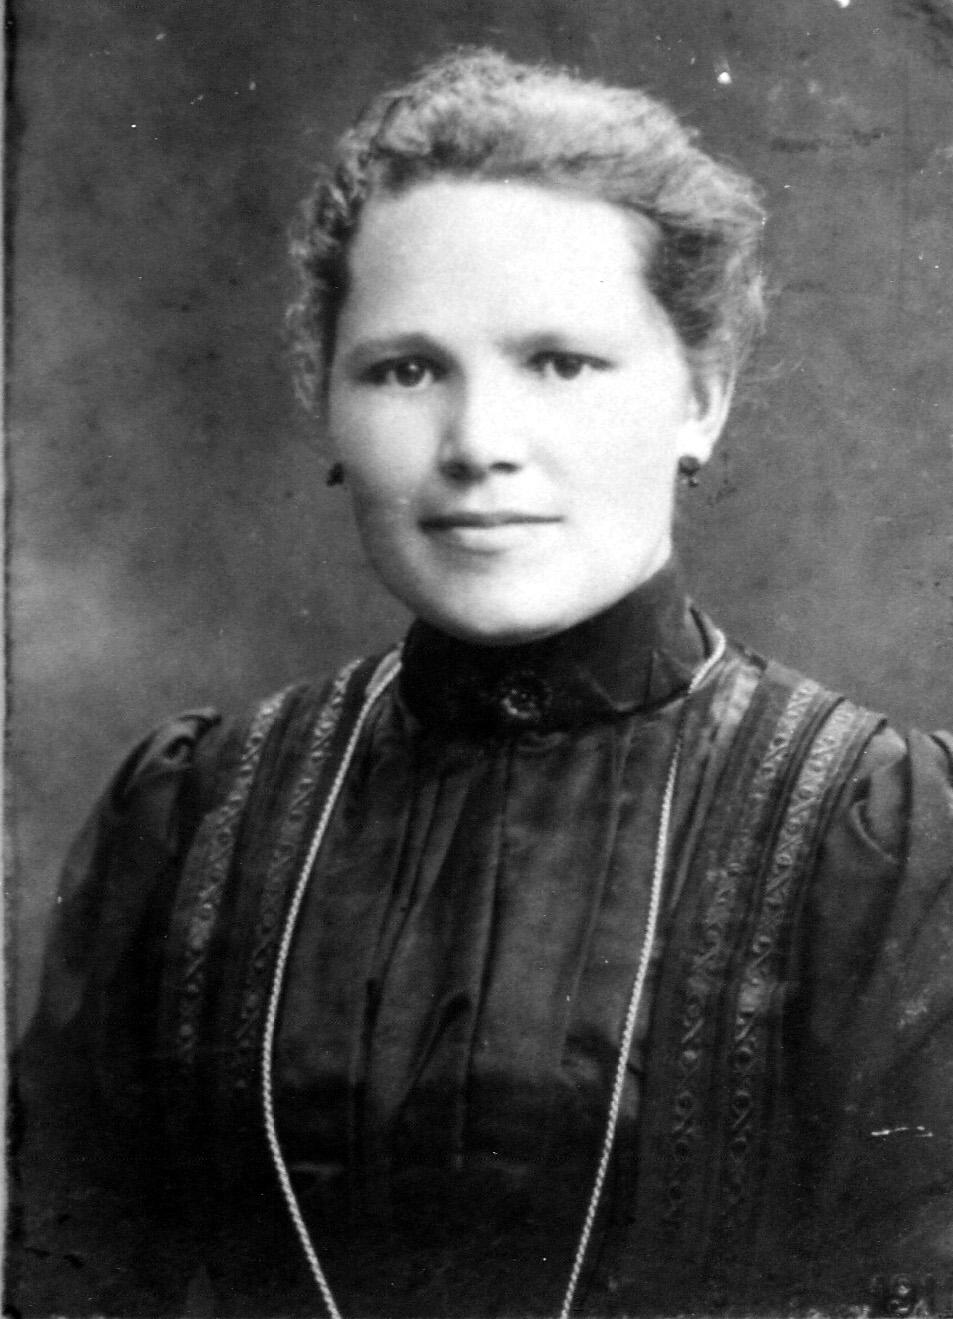 ca1910 Anna Maria (Marie) van der Donk 1886 +1968, gehuwd met Nardus van Boxtel